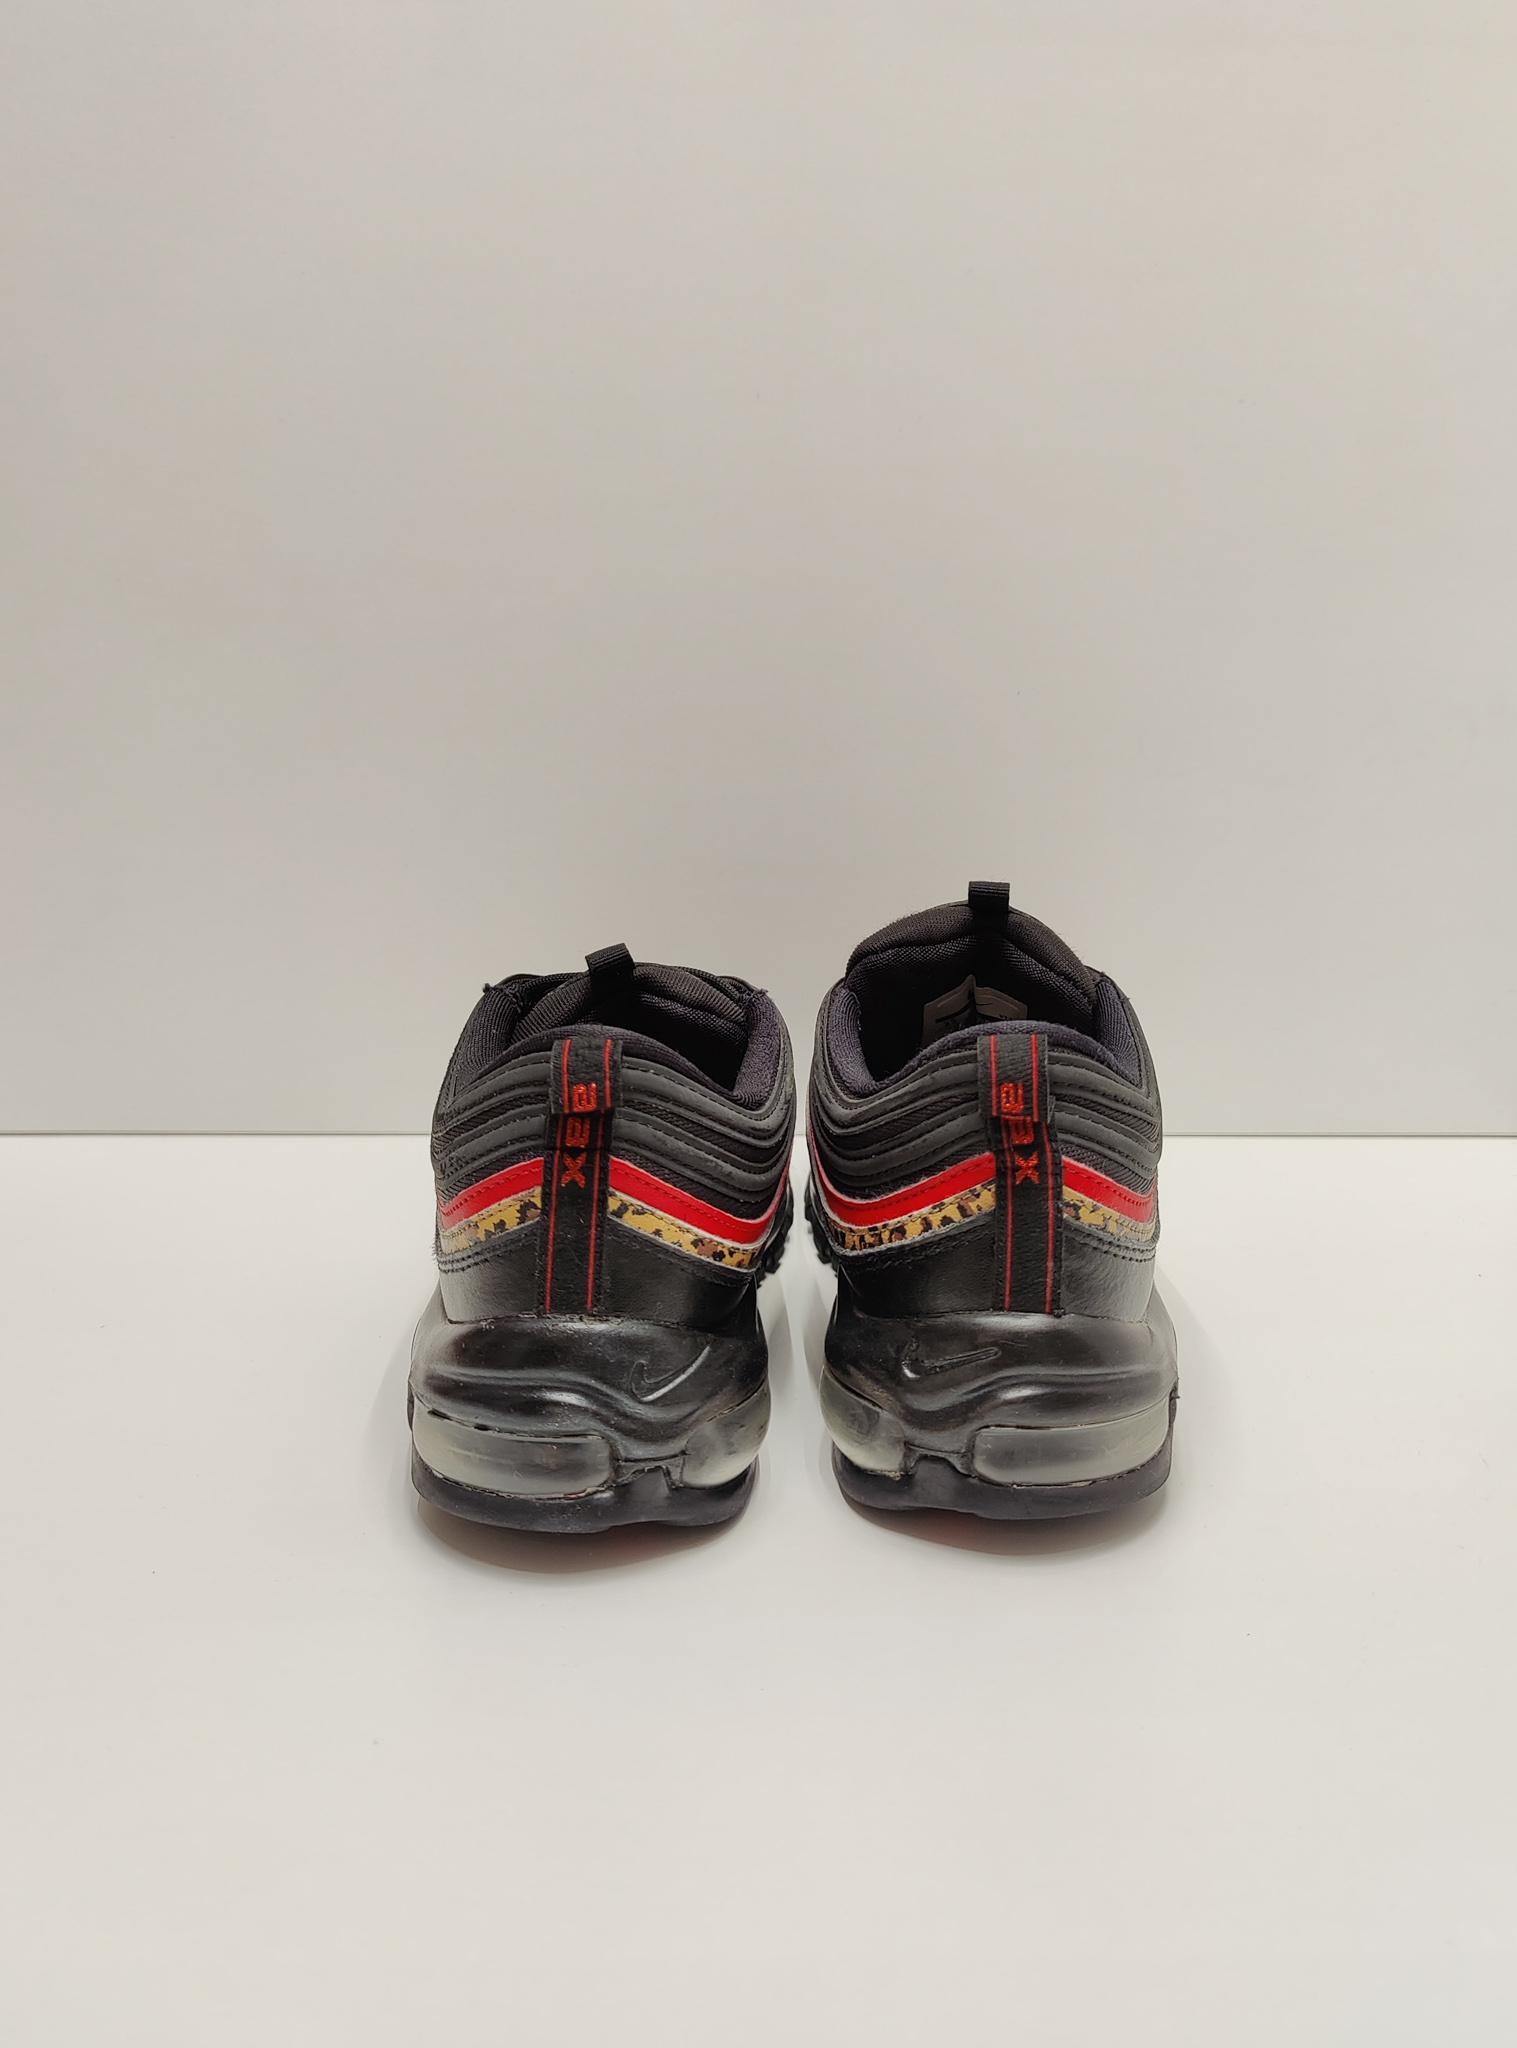 Nike Air Max 97 Leopard Pack Black (W)